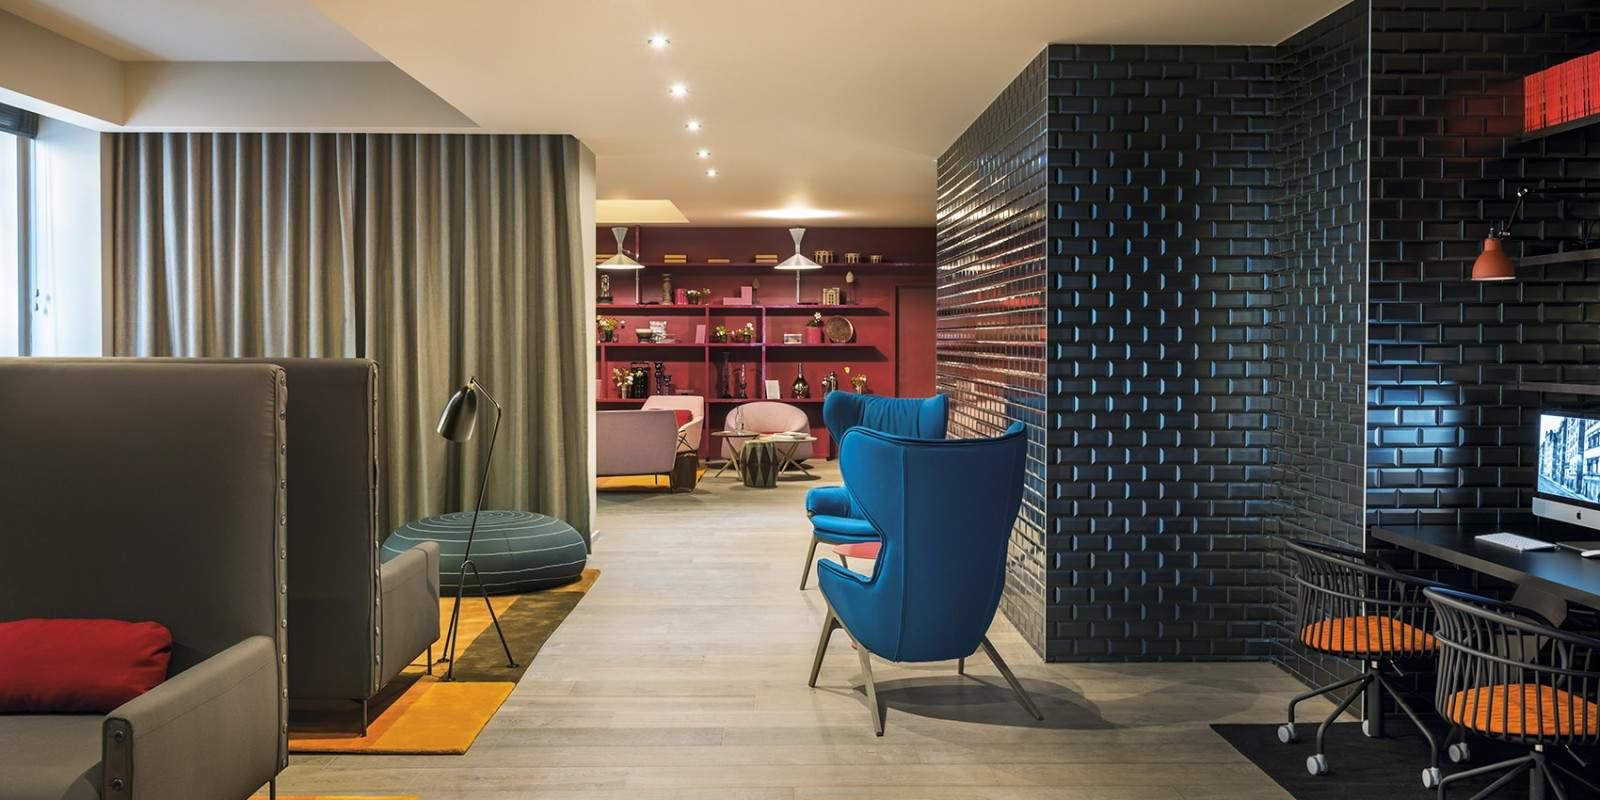 H tel design lyon okko hotels deco design for Lyon hotel design